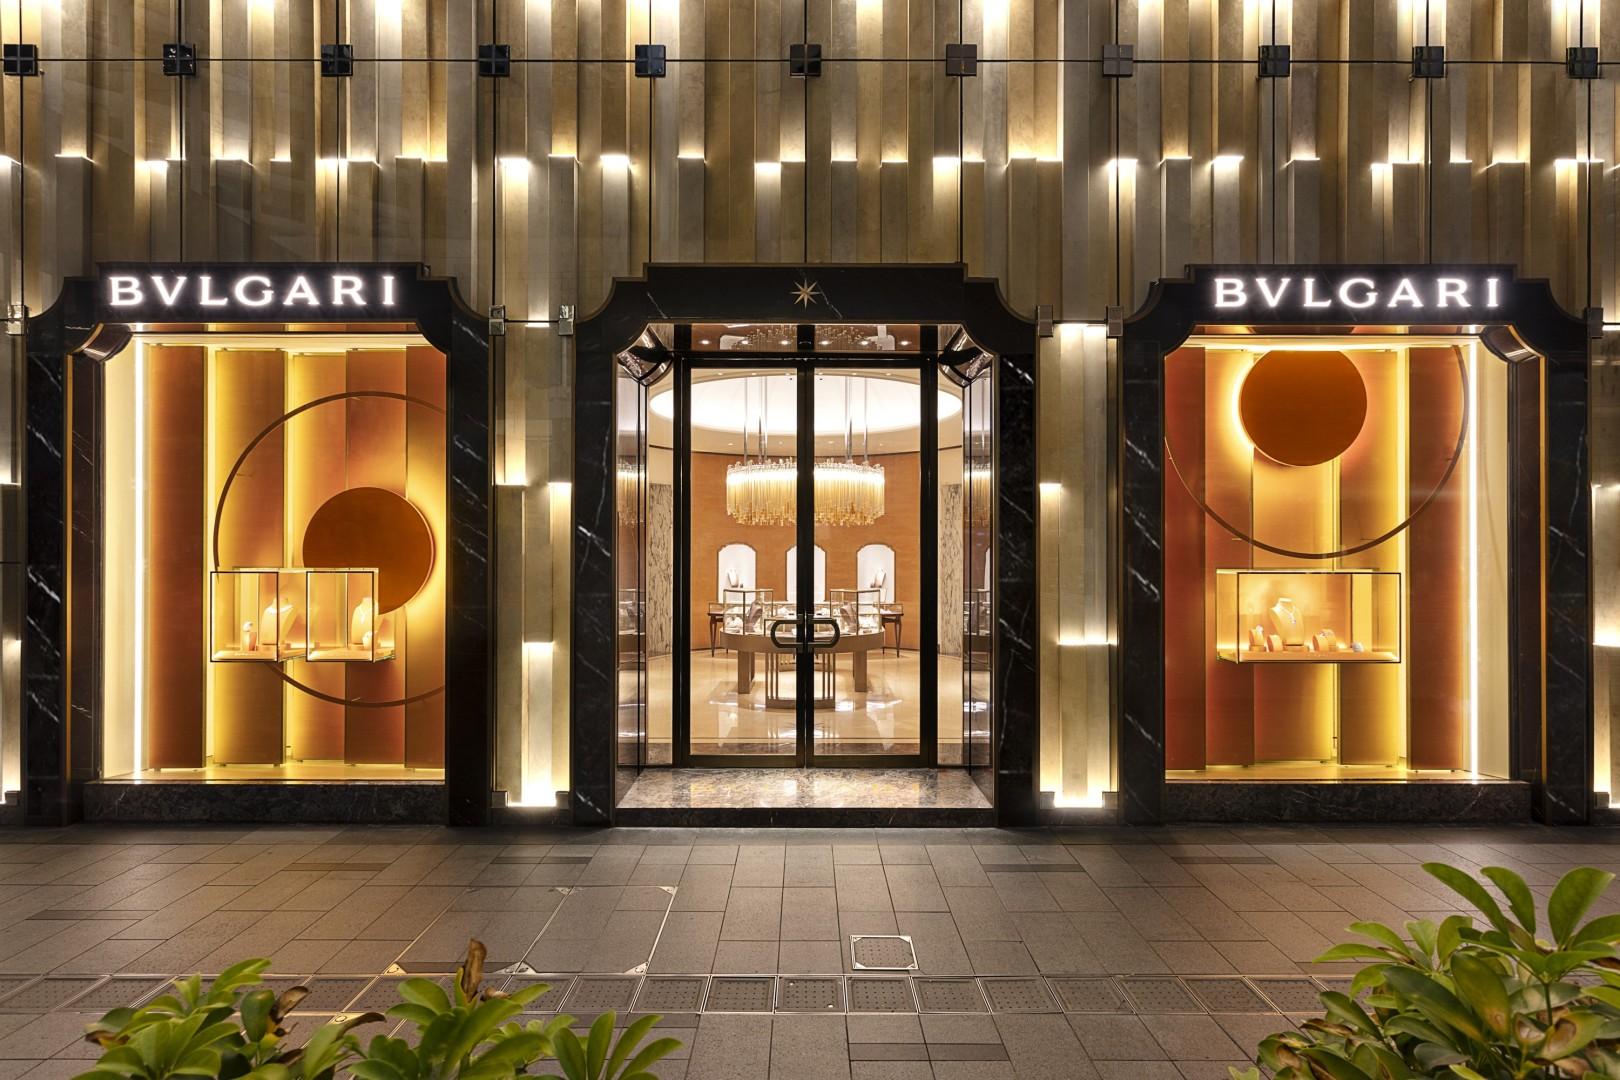 71ea69a3b7e3f Bulgari's renovated flagship store in Hong Kong reflects the glamorous  essence of Rome | South China Morning Post